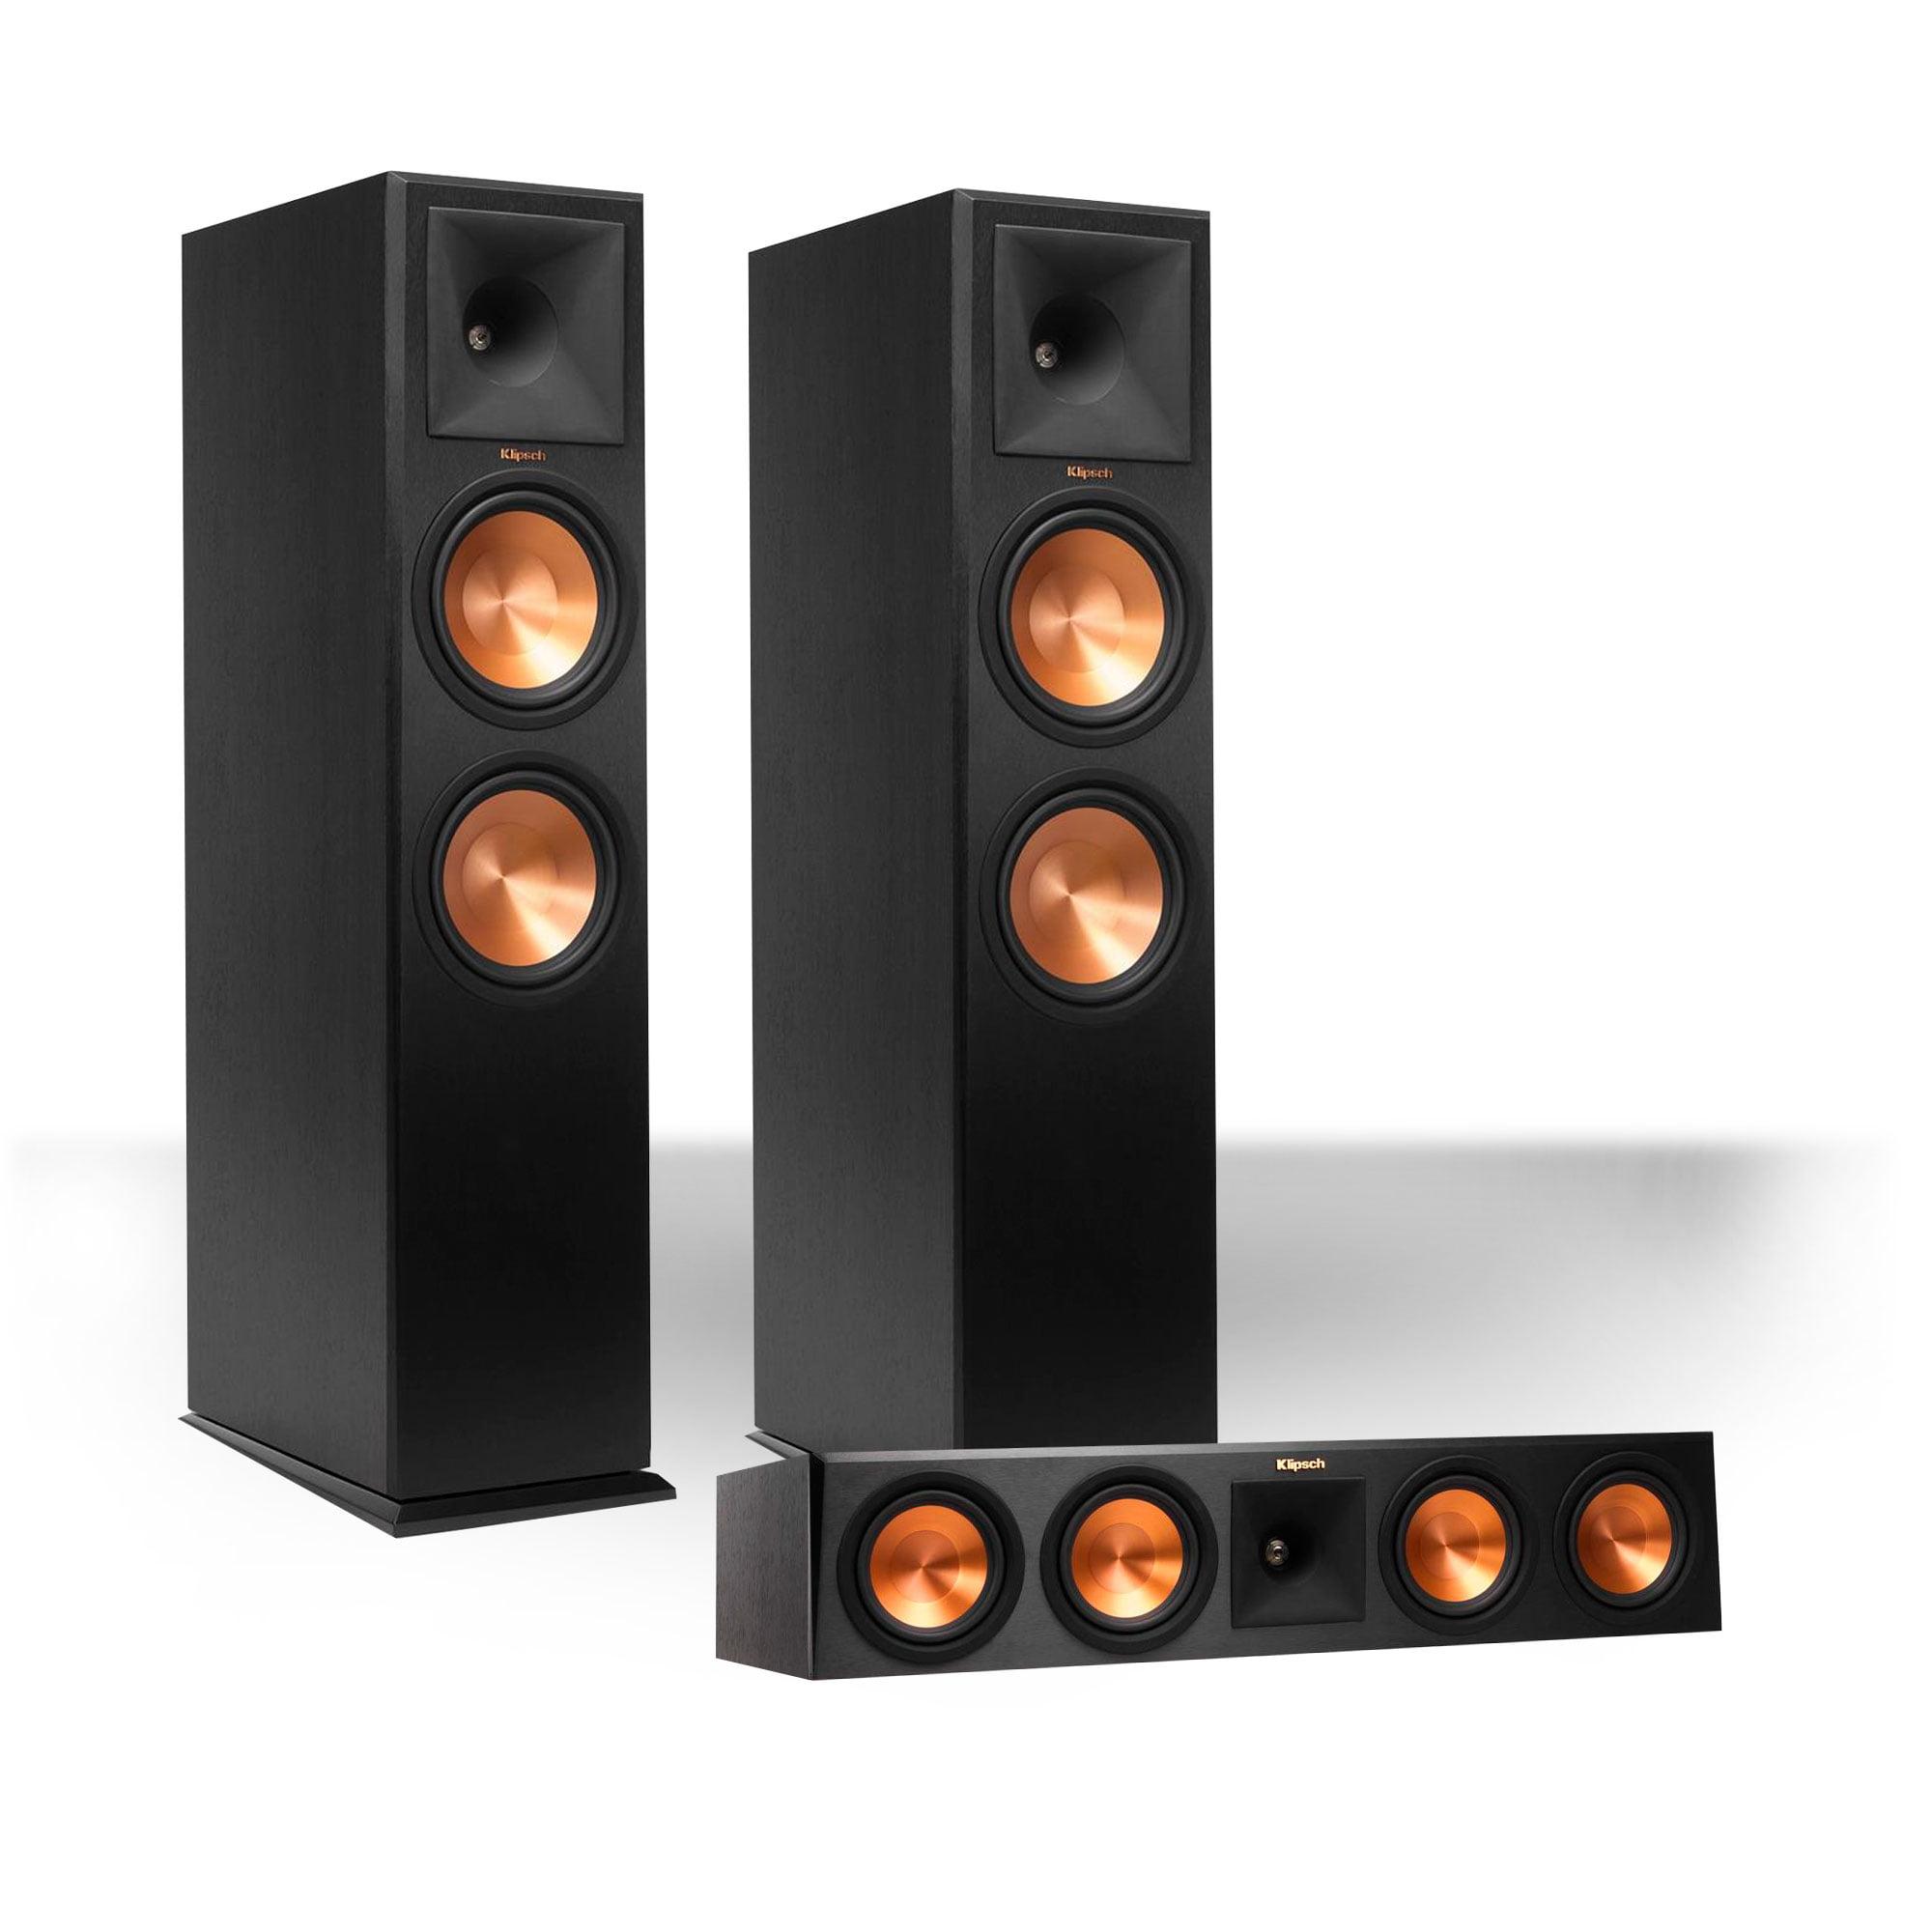 Klipsch RP-280F Reference Premiere Floorstanding Speaker Package with RP-450C Center Channel Speaker by Klipsch